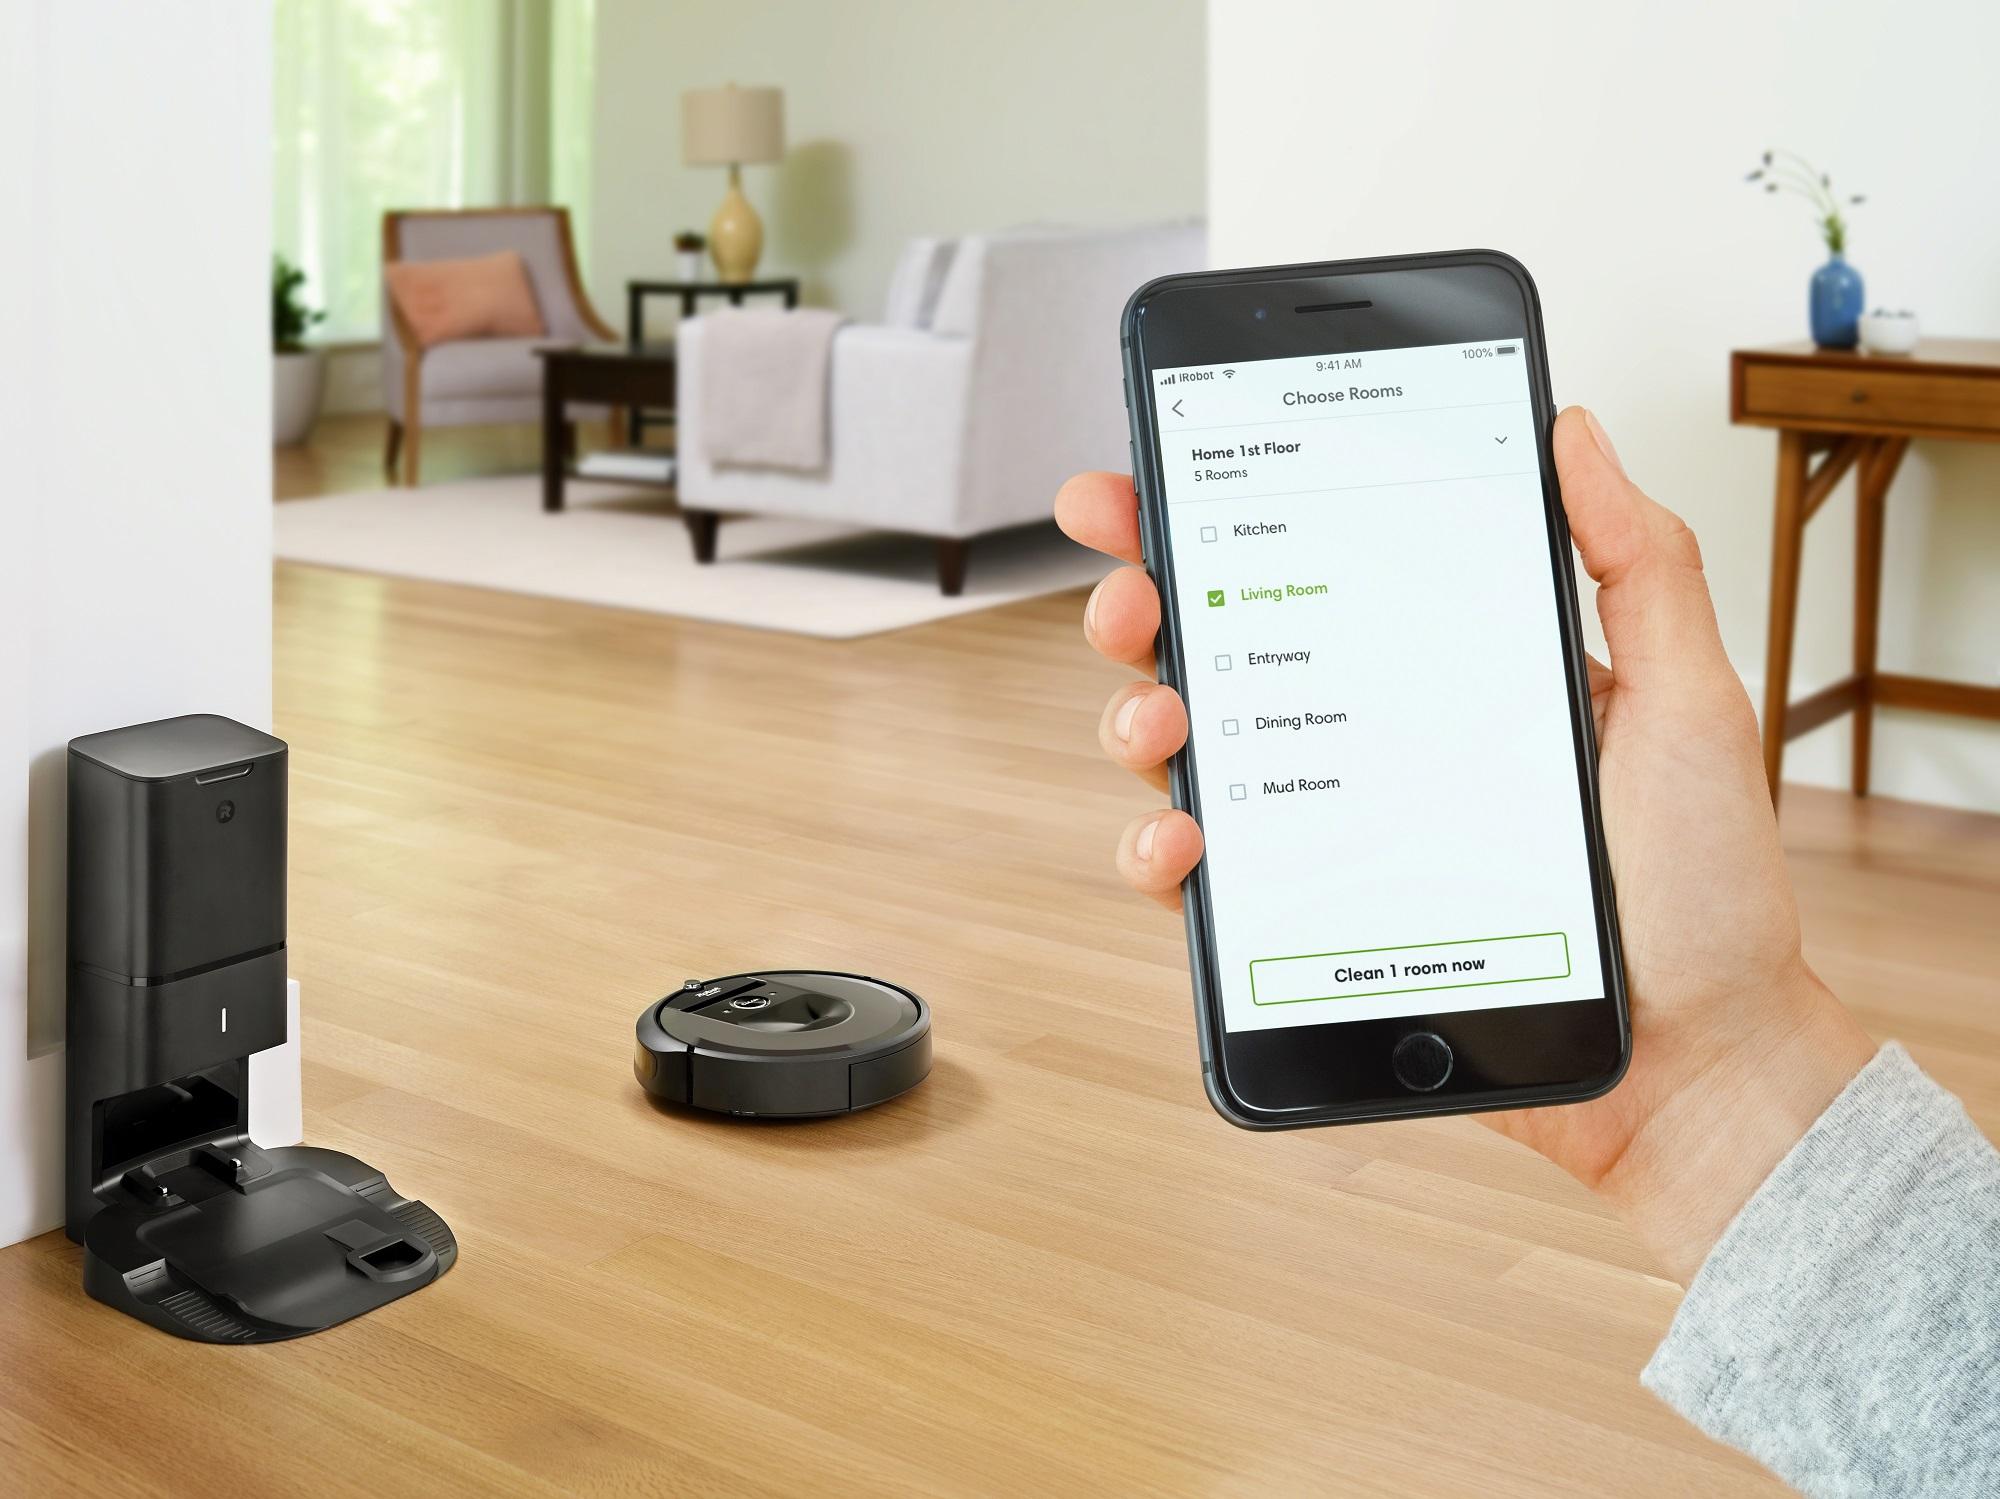 iRobot Roomba i7 with smartphone and docking base